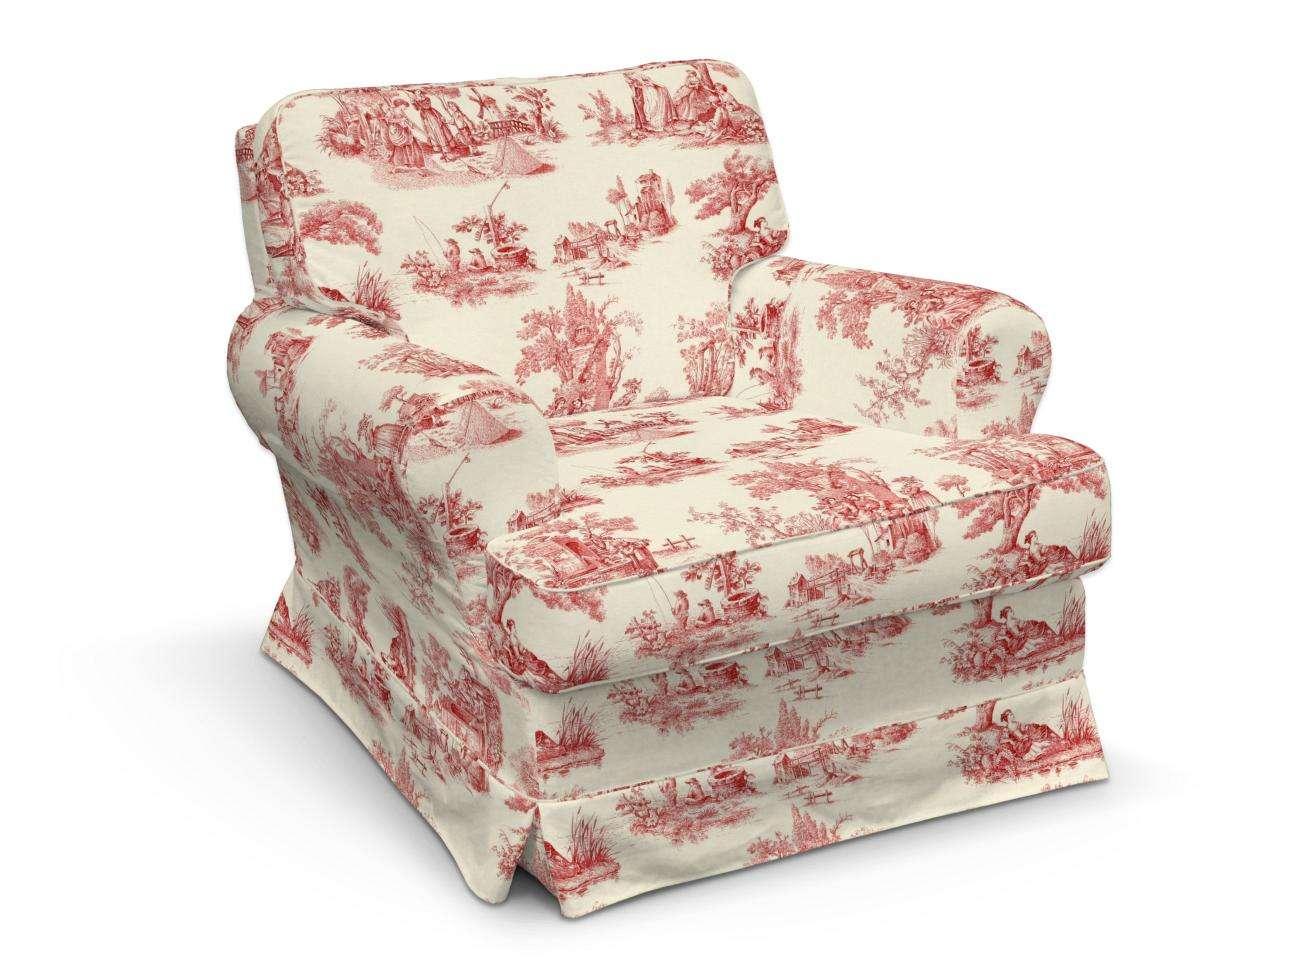 Barkaby Sesselbezug Sessel  Barkaby von der Kollektion Avinon, Stoff: 132-15